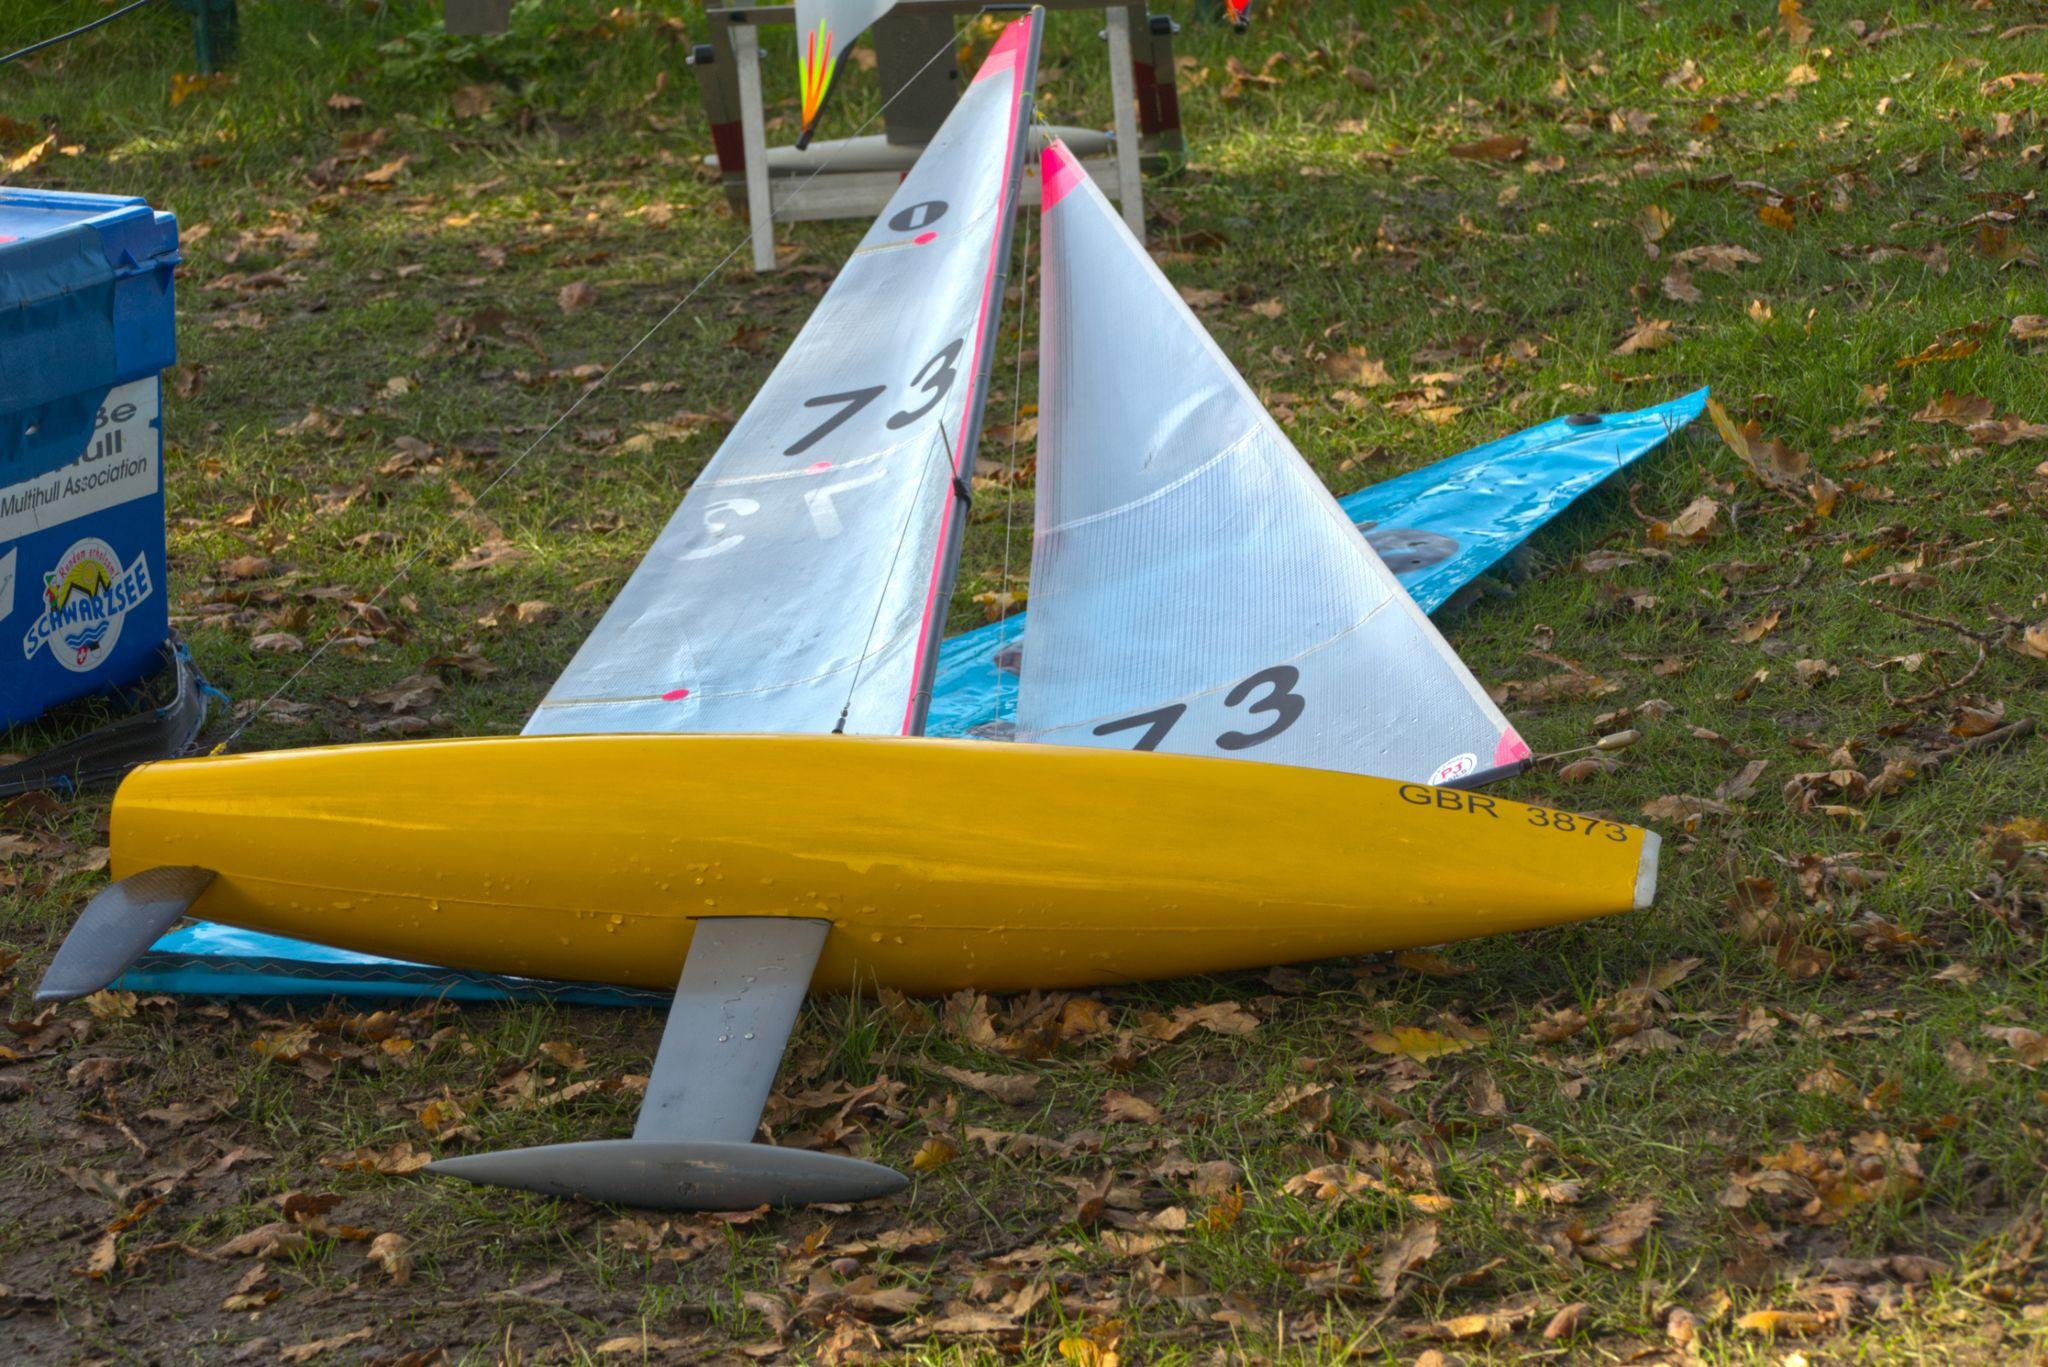 International One Metre Racing - Poole